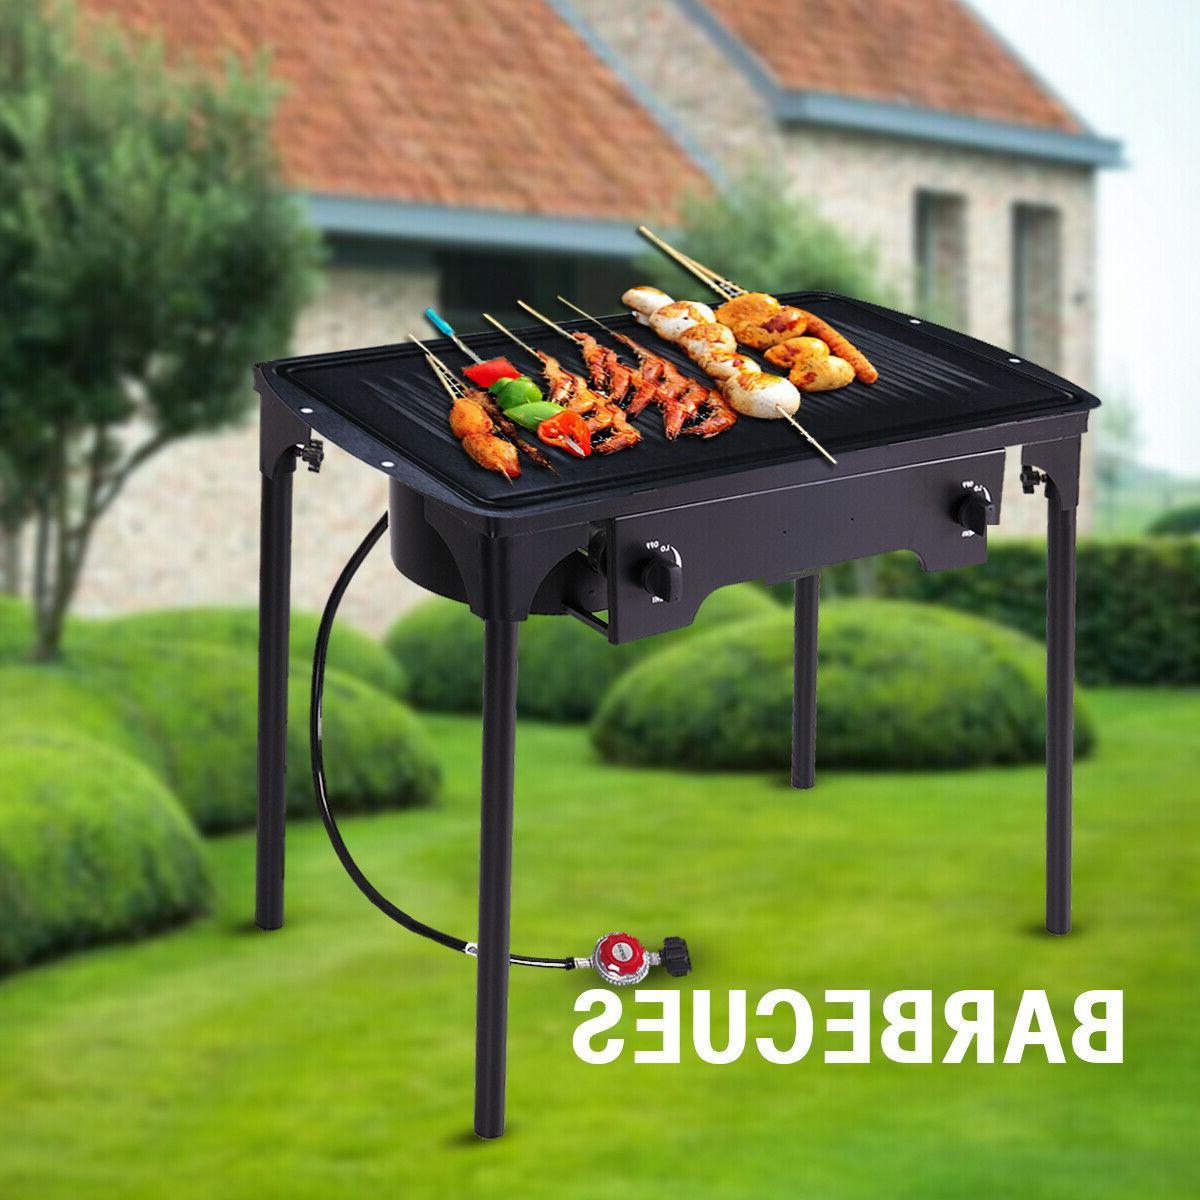 double burner gas propane cooker